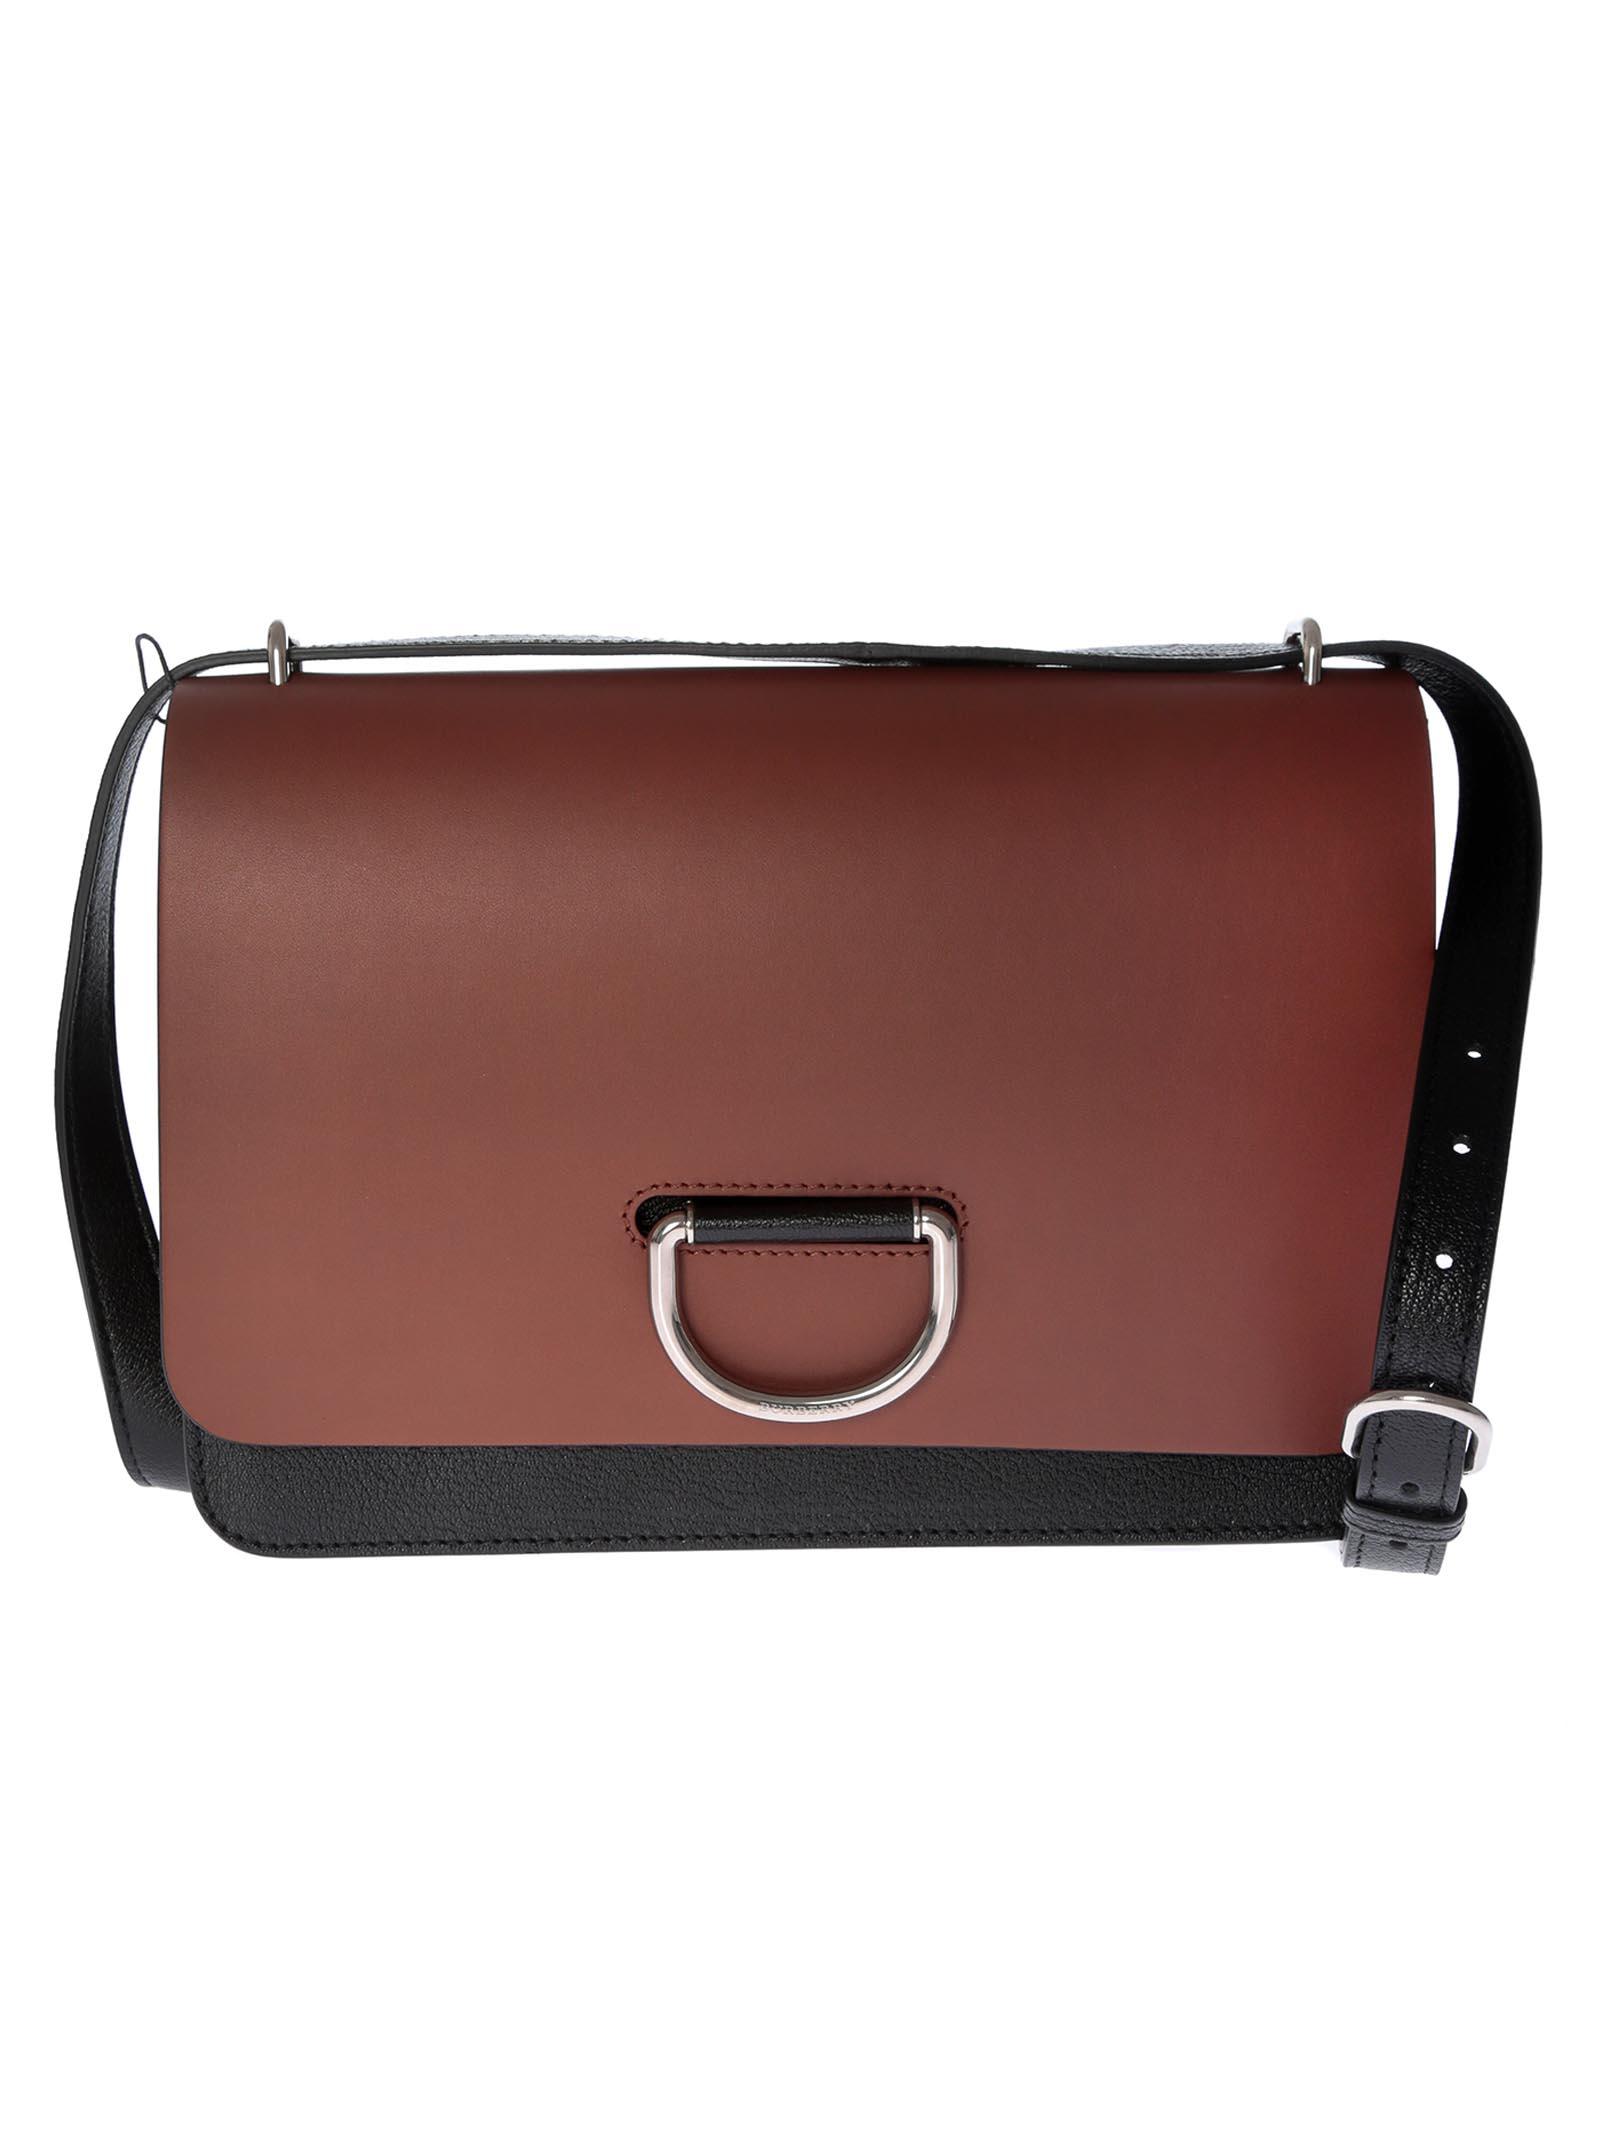 e348d8a3ba3d Burberry Burberry The Medium D-ring Shoulder Bag - Basic - 10652847 ...